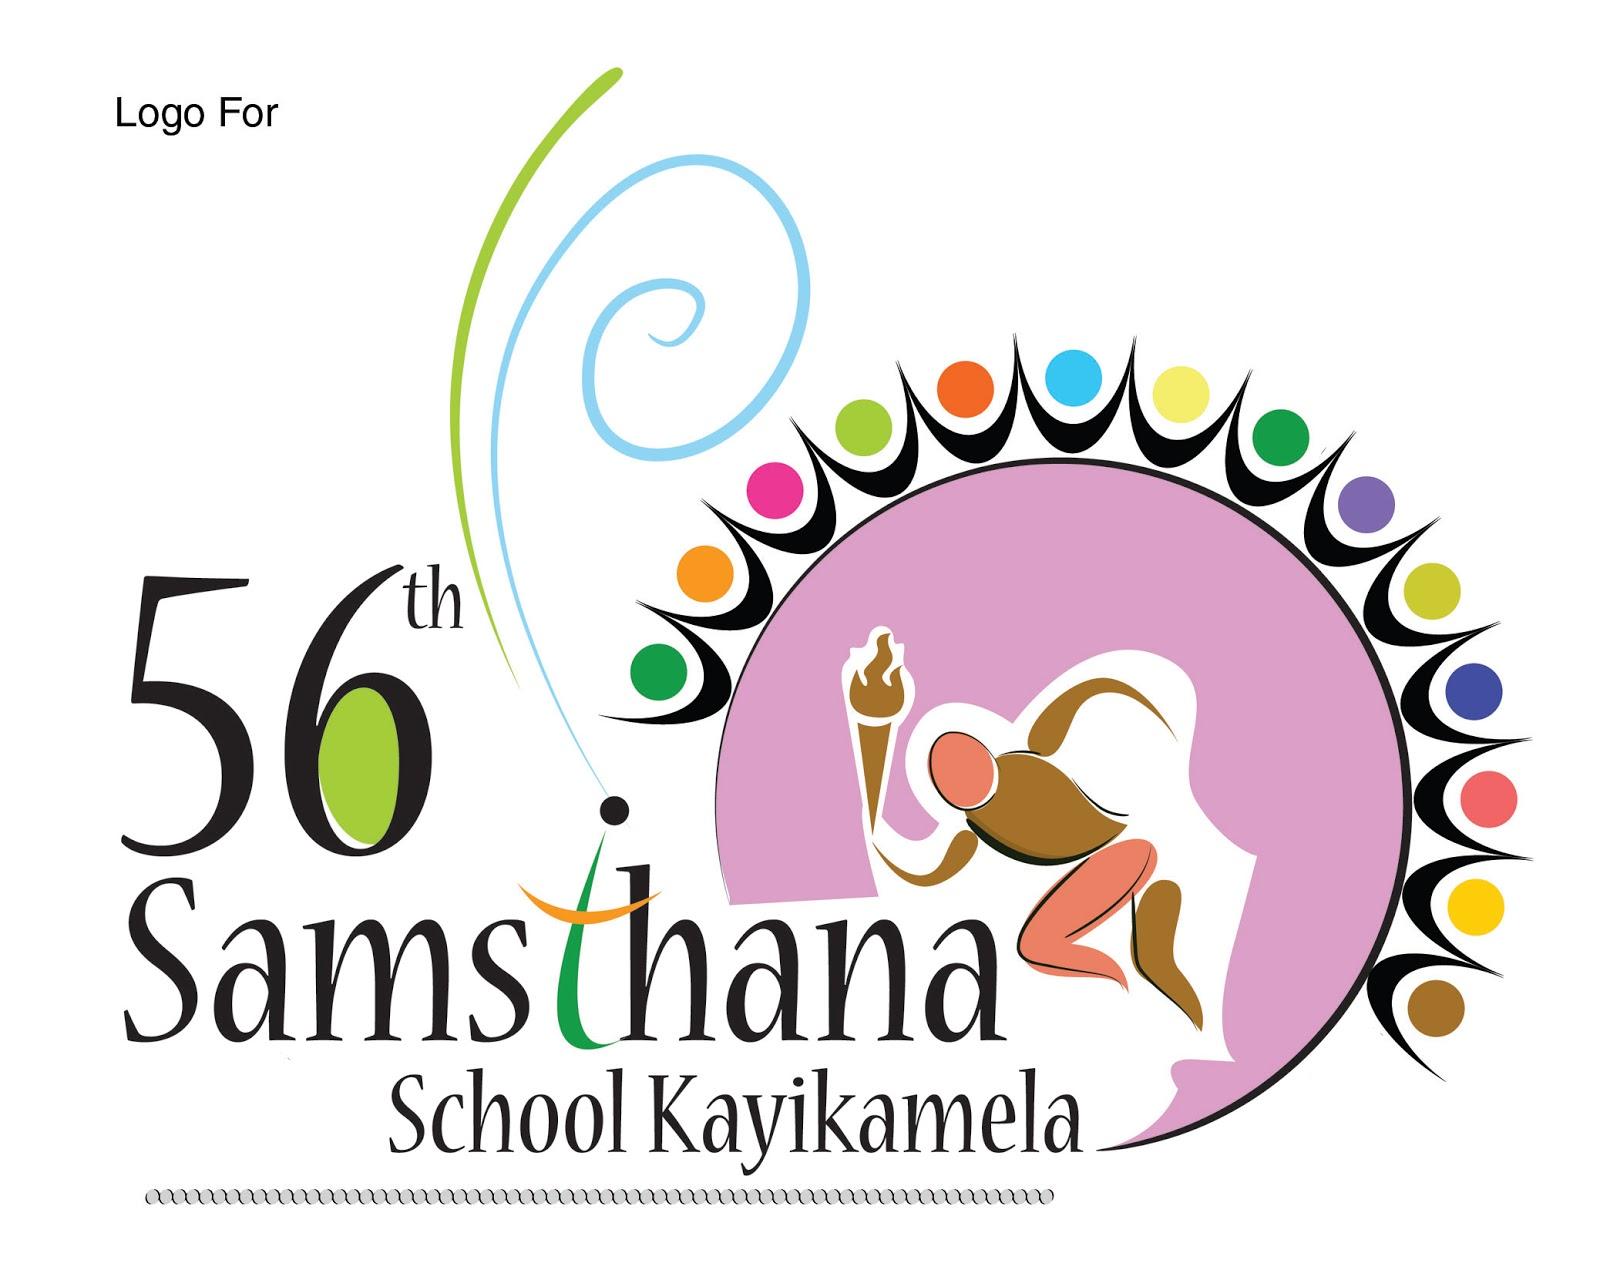 achinamal samsthana school kayikamela logo design sample